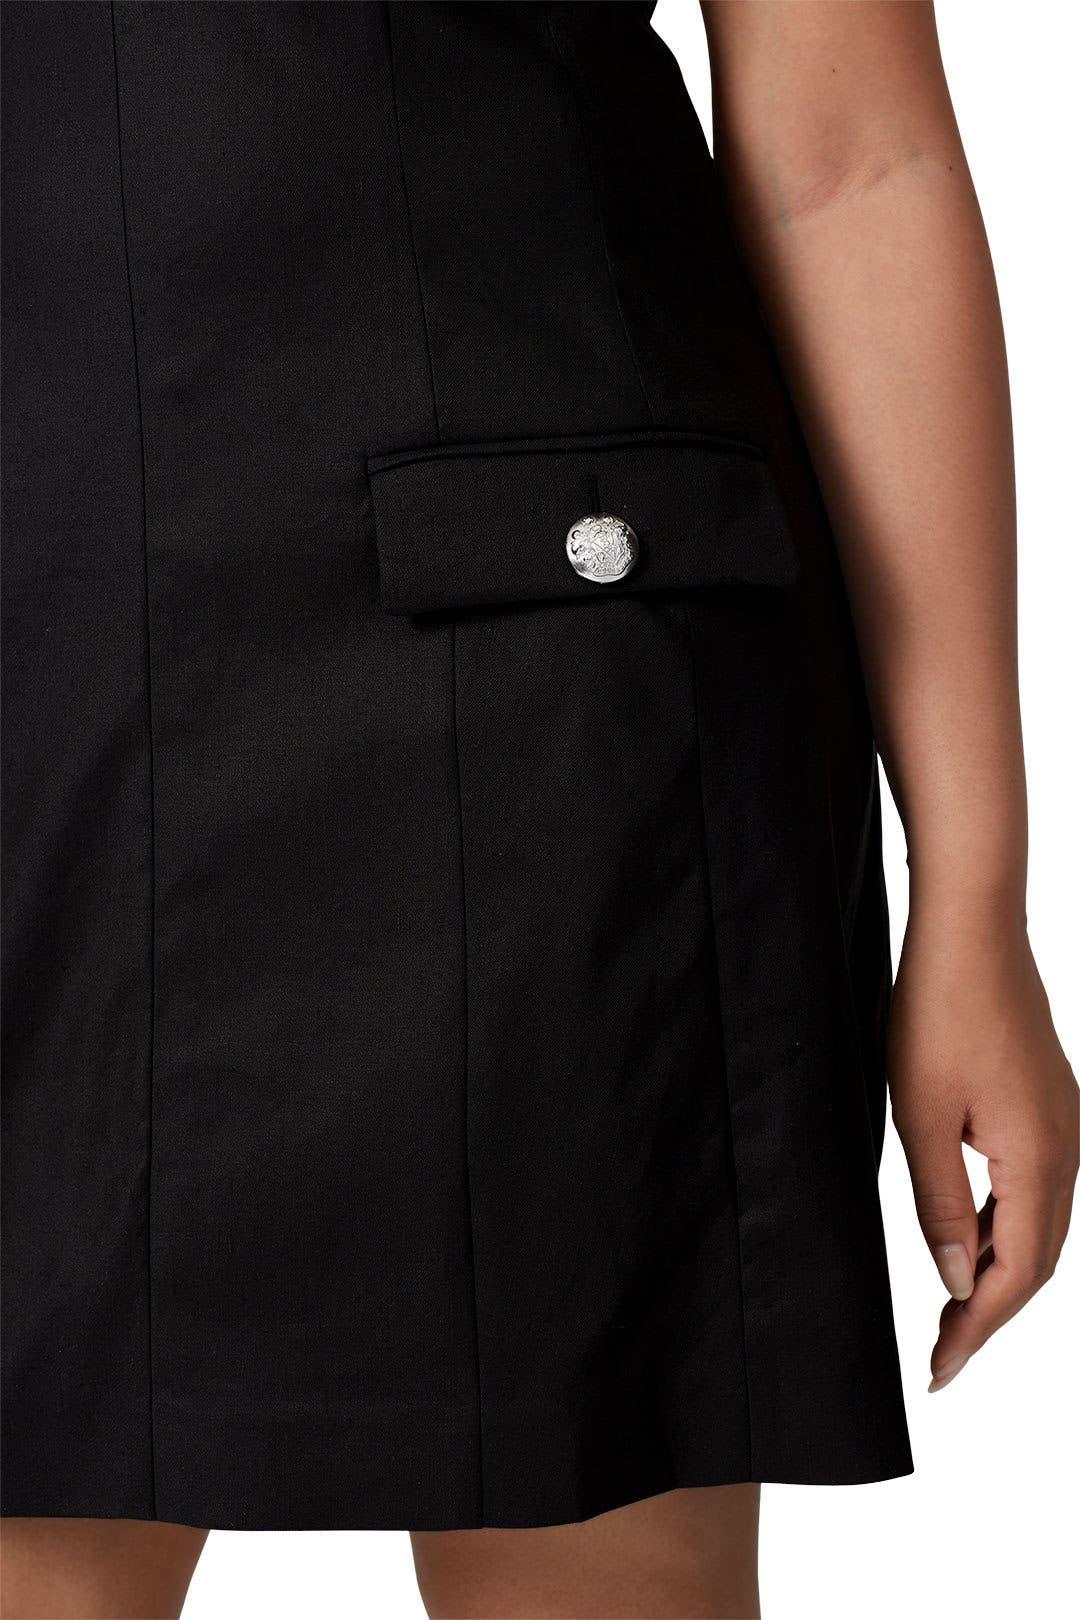 Veronica Beard Black Skylar Dress